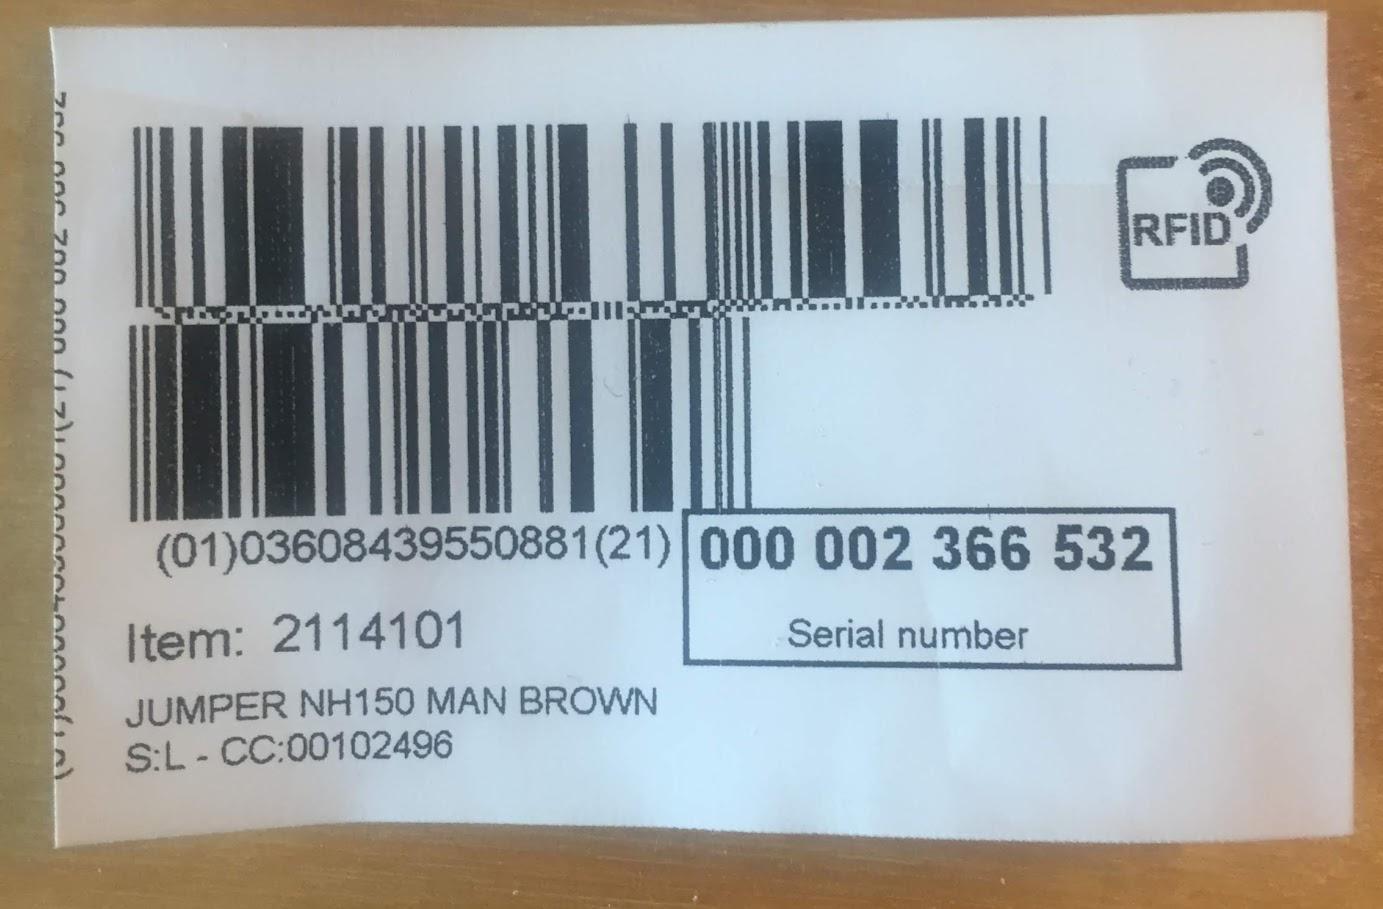 RFID, l'étiquette anti-vol